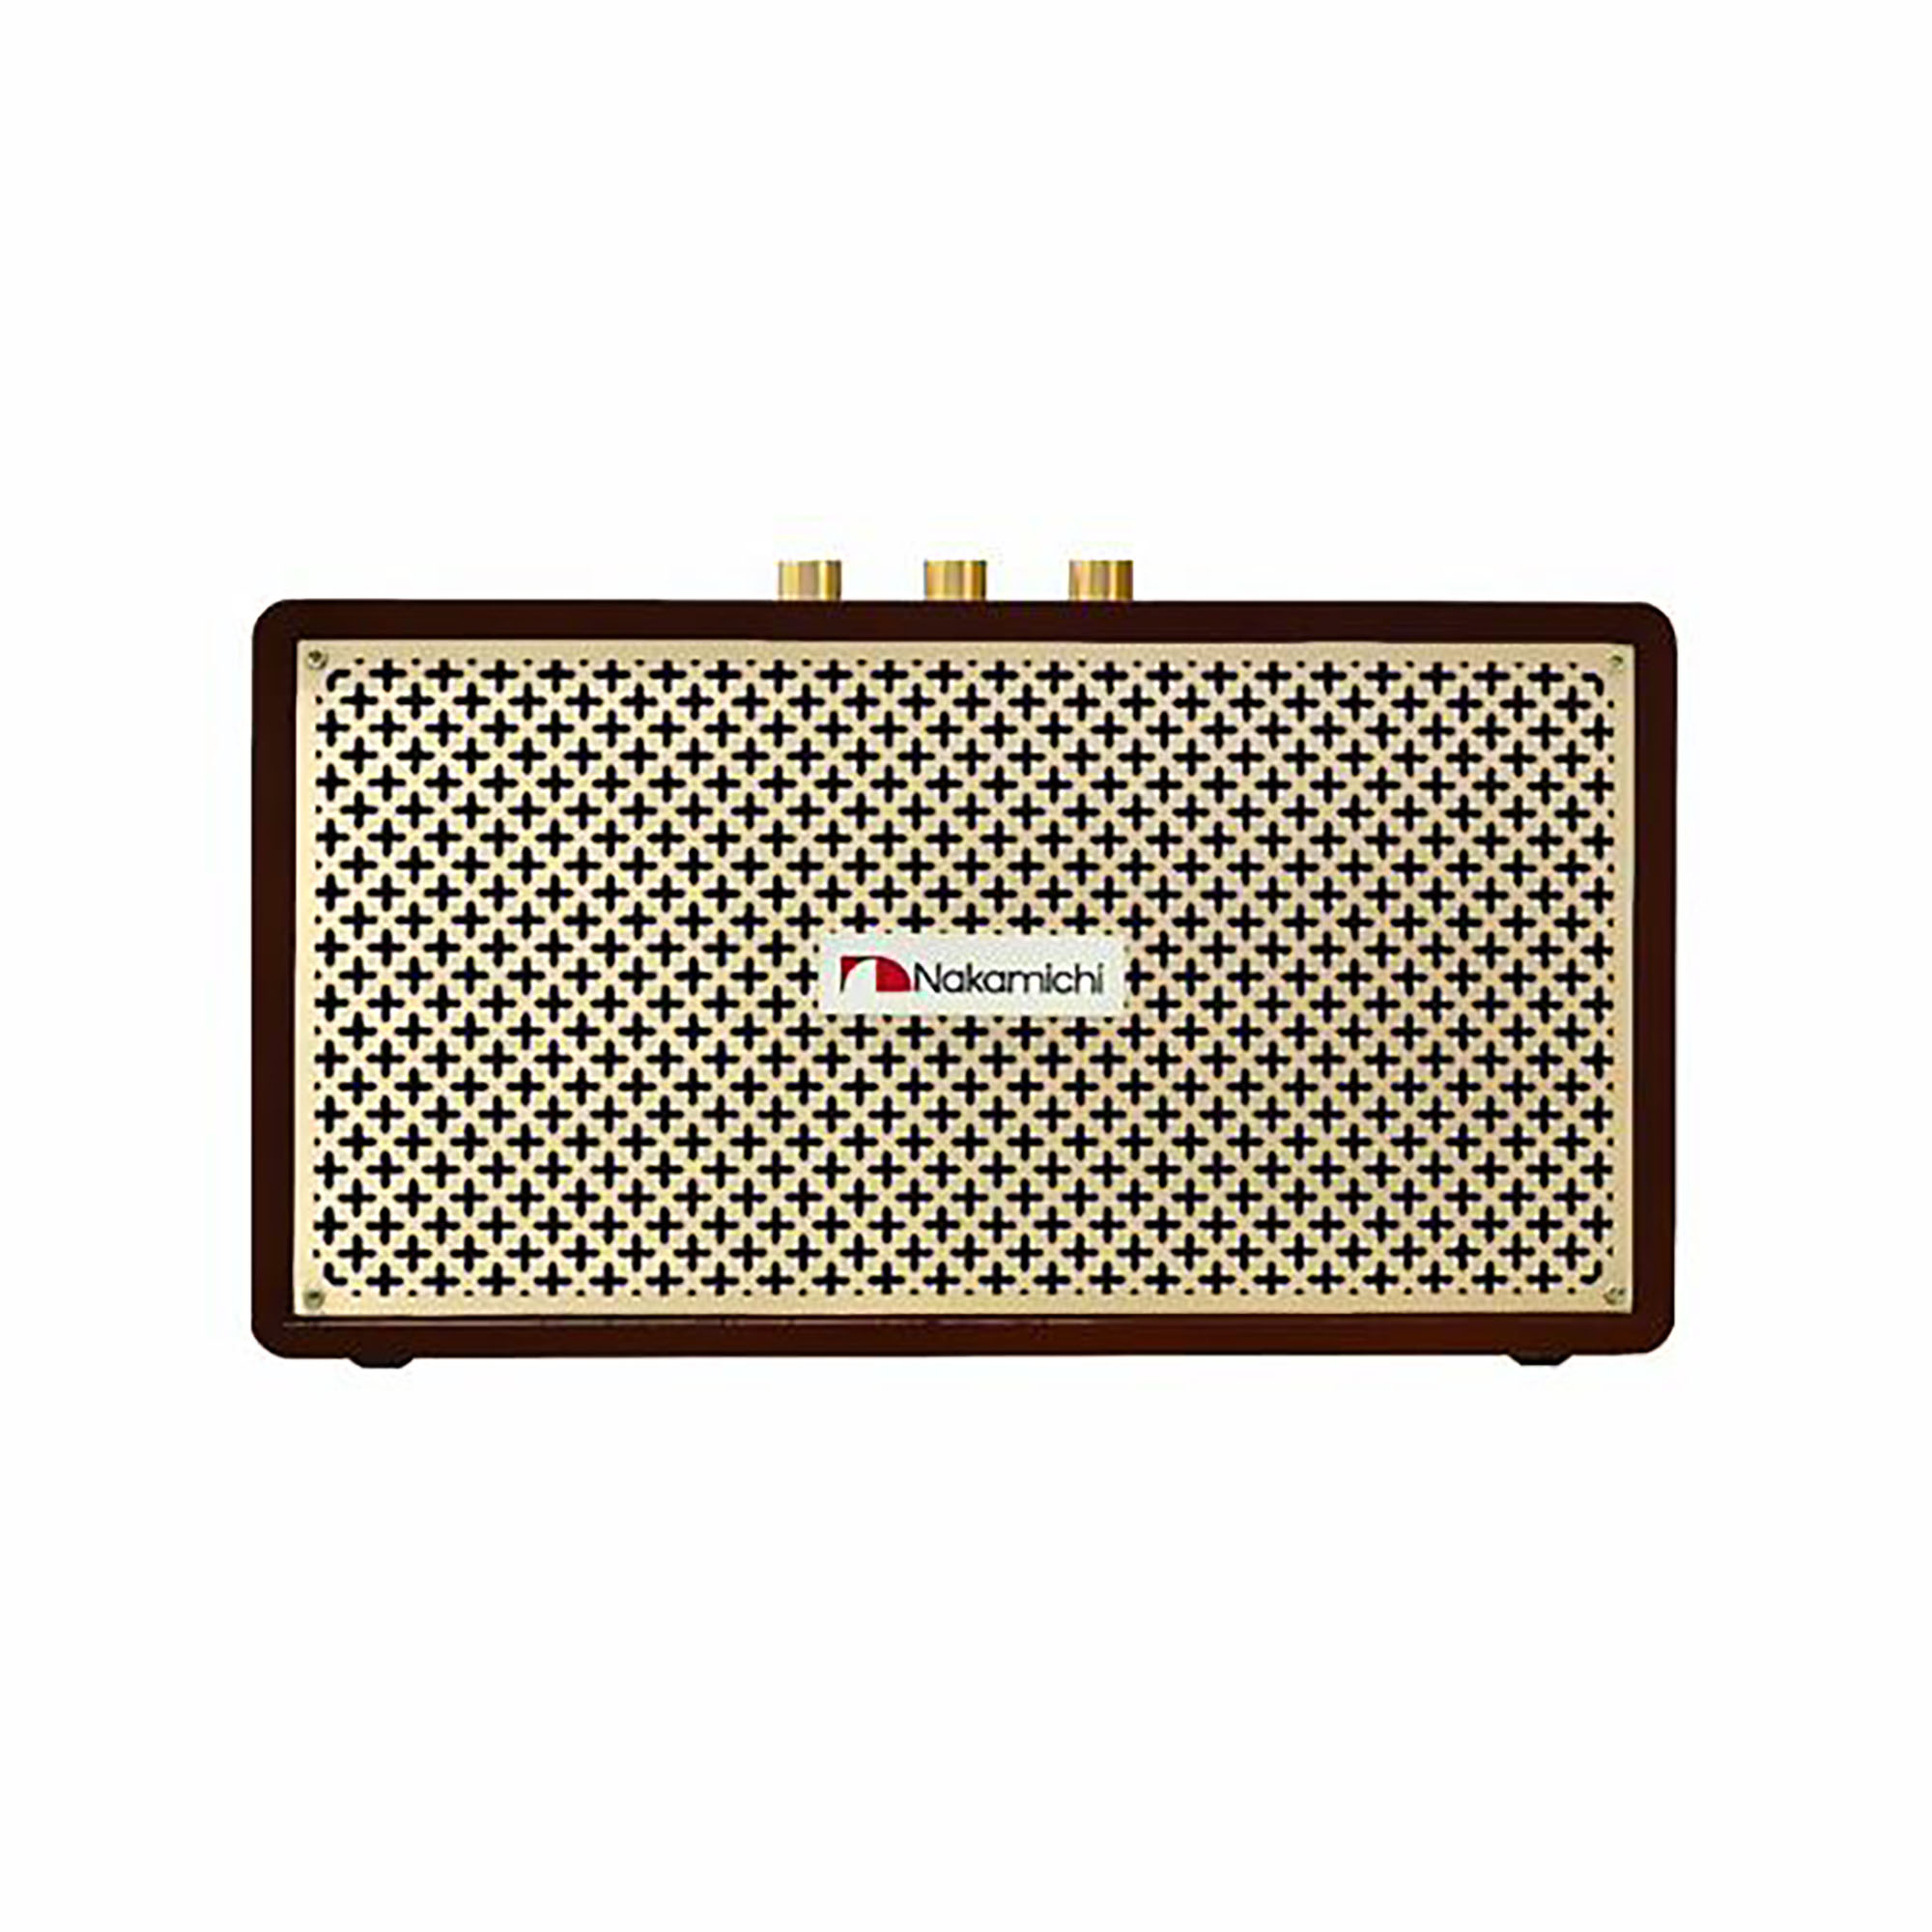 Nakamichi Jukebox /BT/USB/AUX (Marrom)